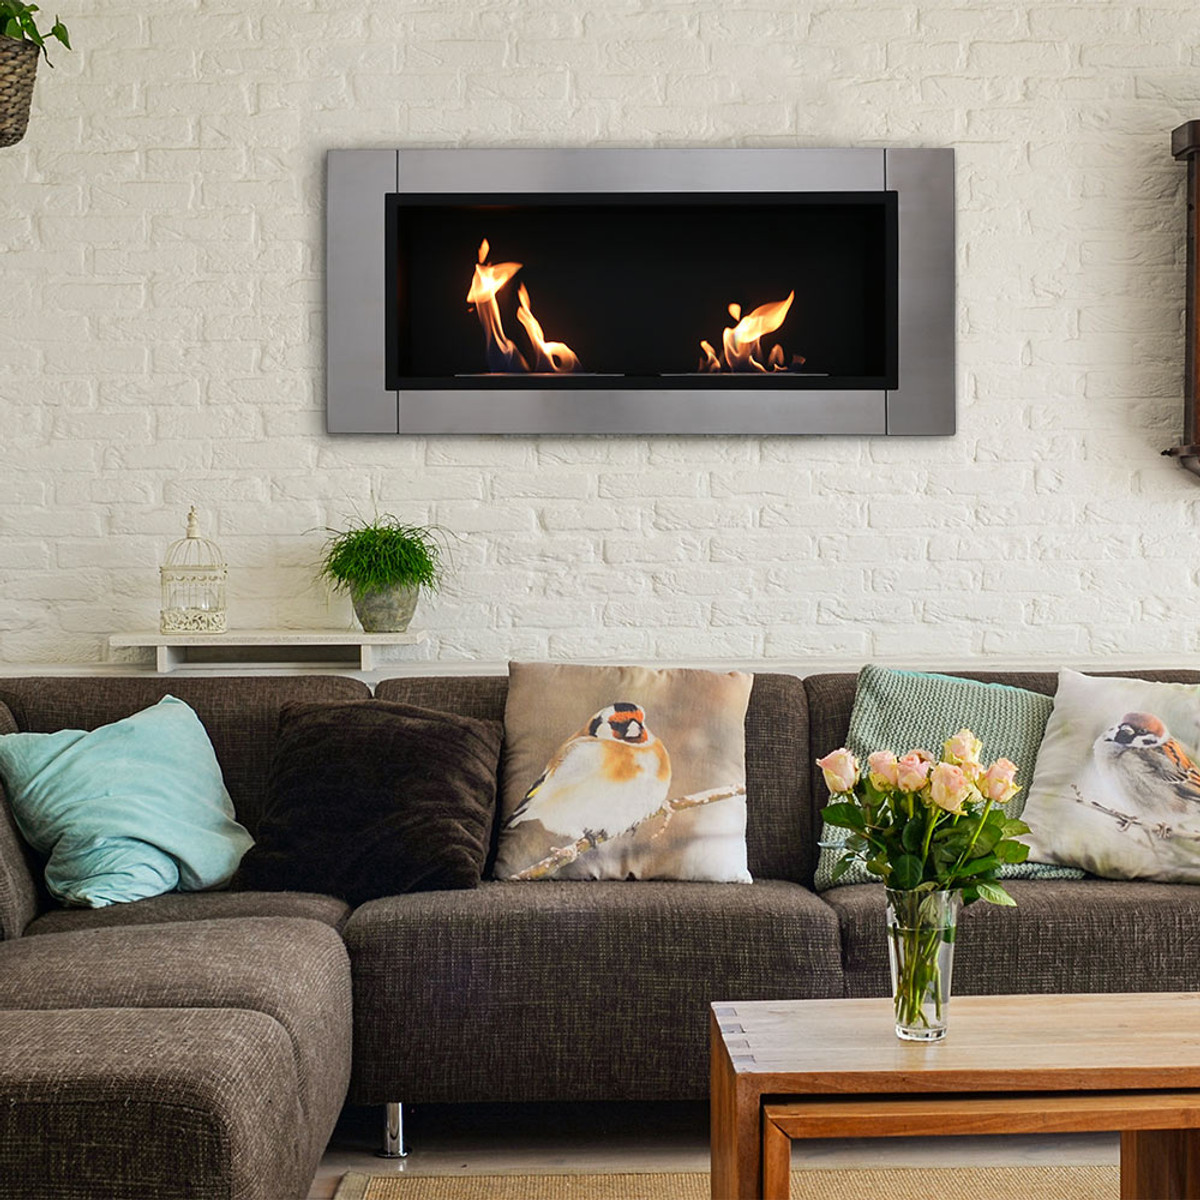 Sunnydaze Scalda Ventless Wall Mounted Bio Ethanol Fireplace 43 Inch